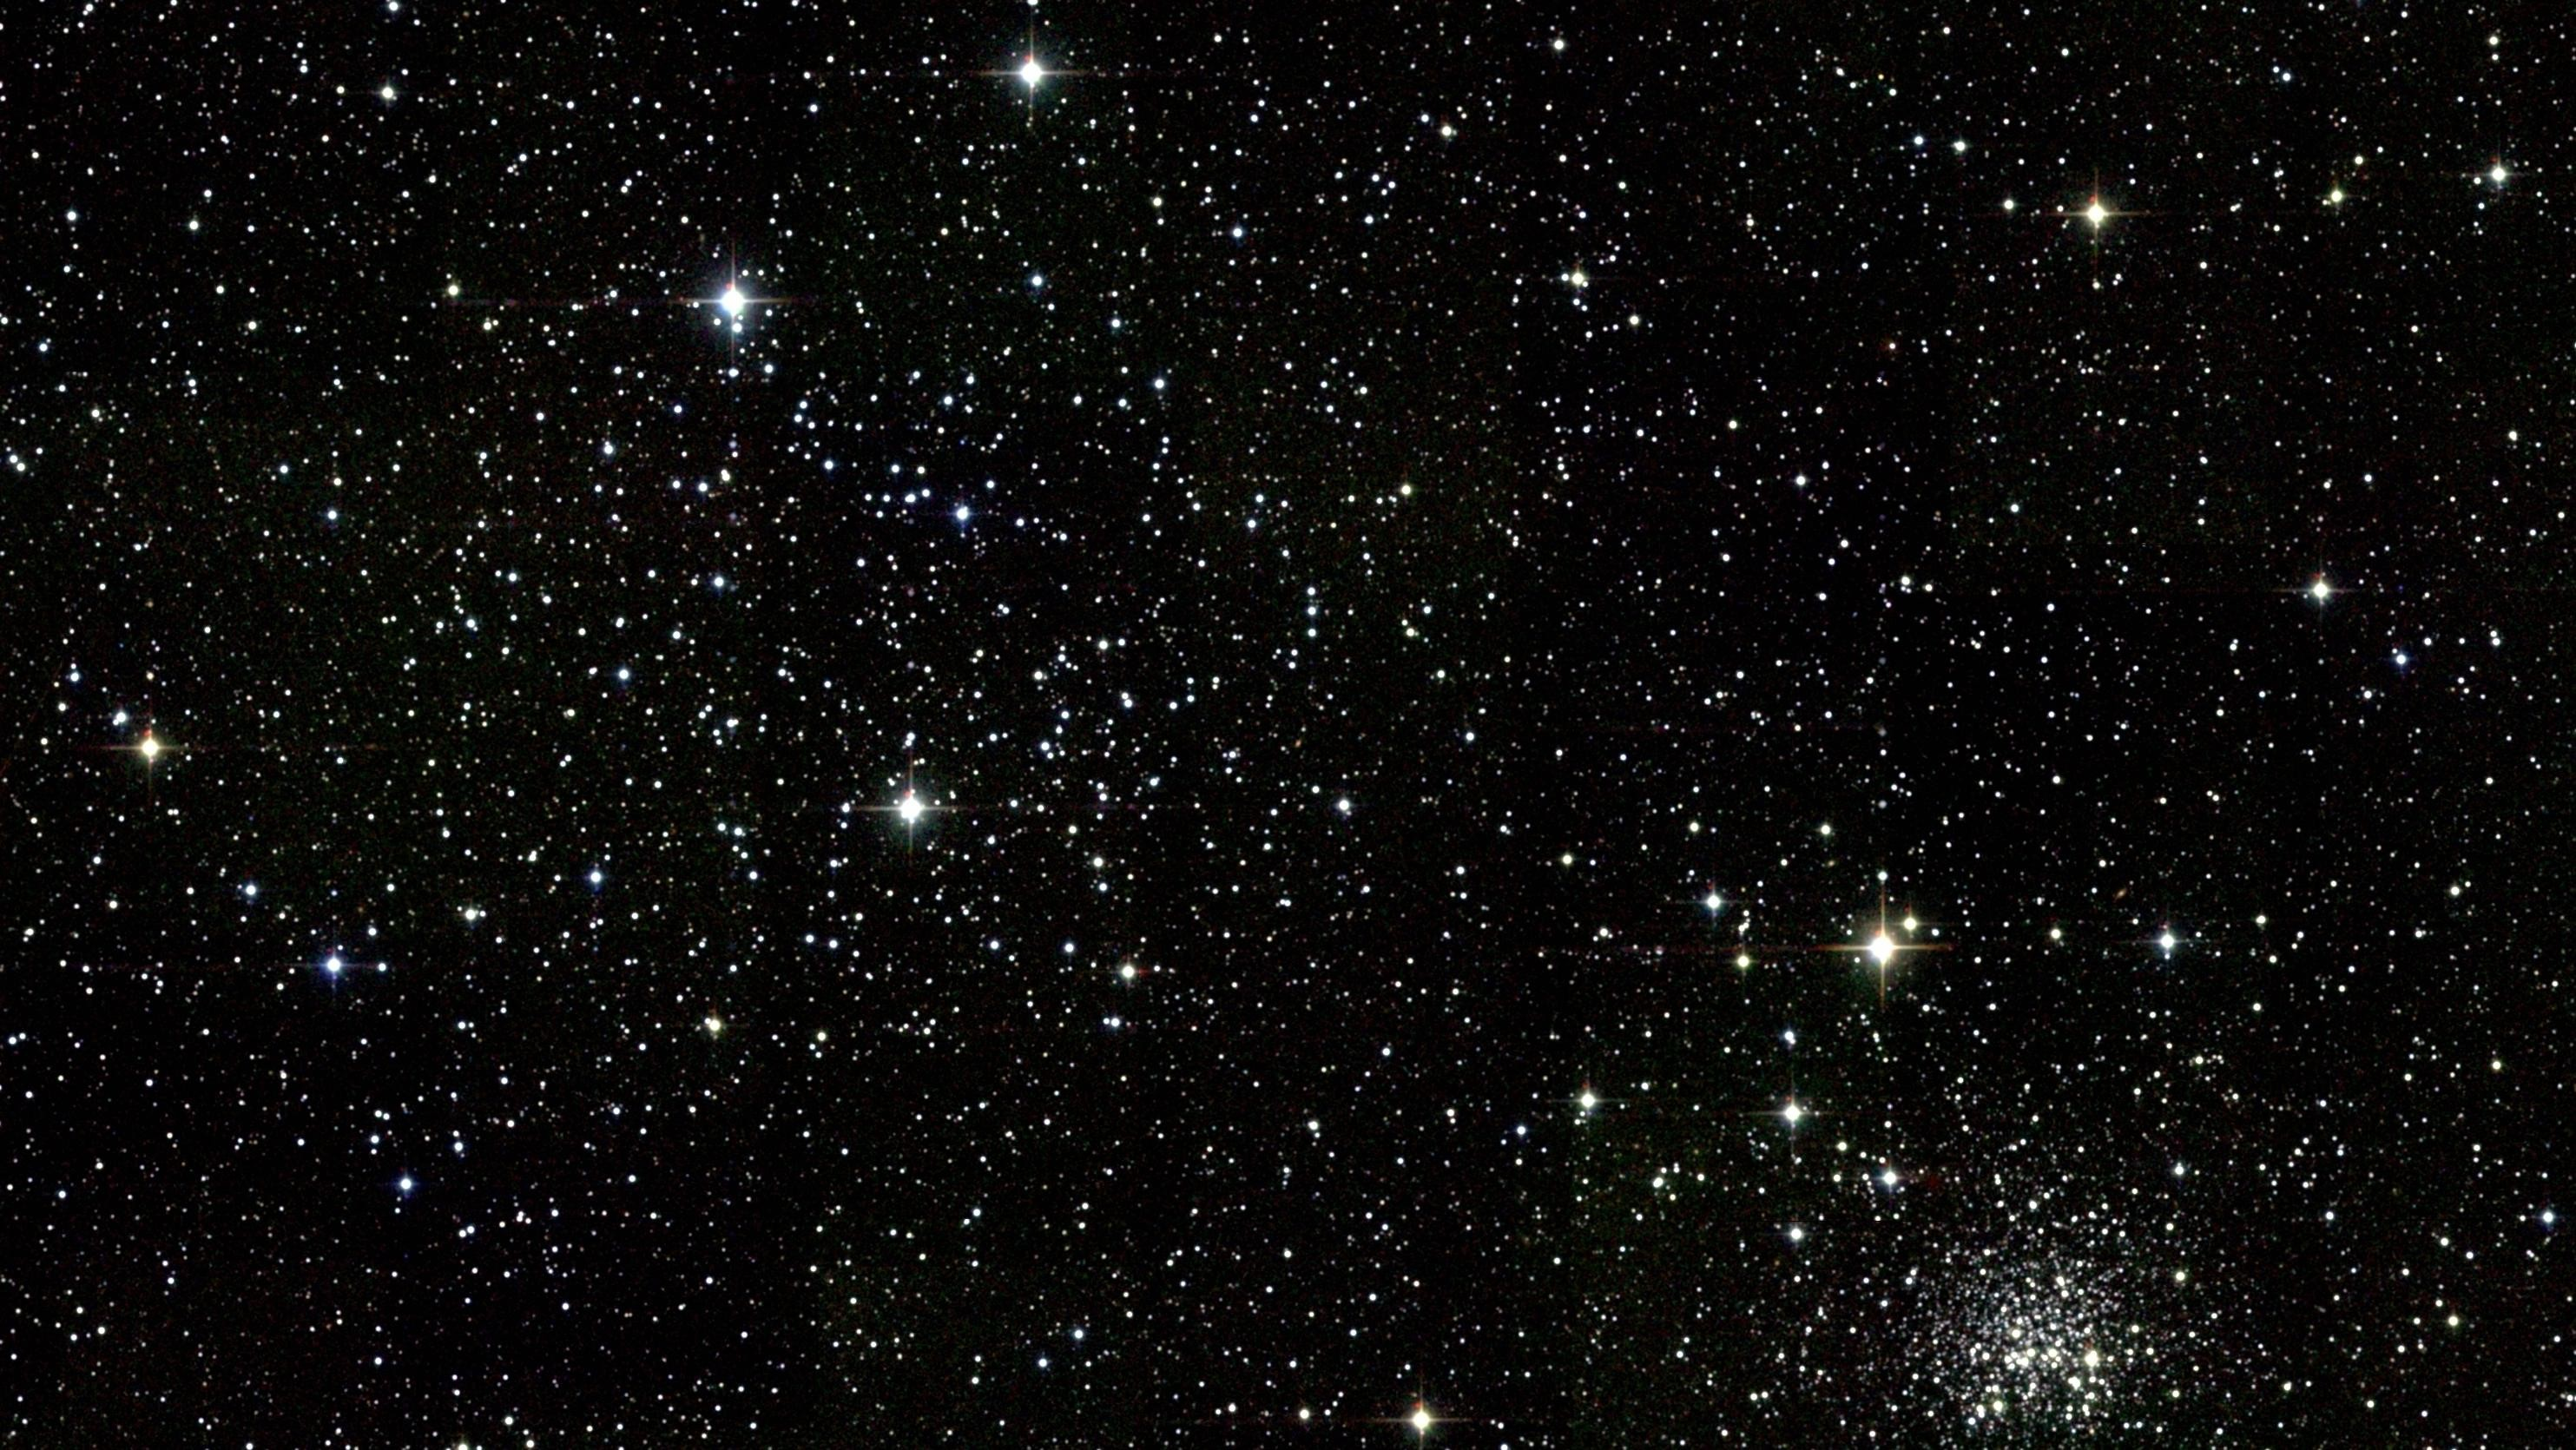 stars and planets photo img331 JPG